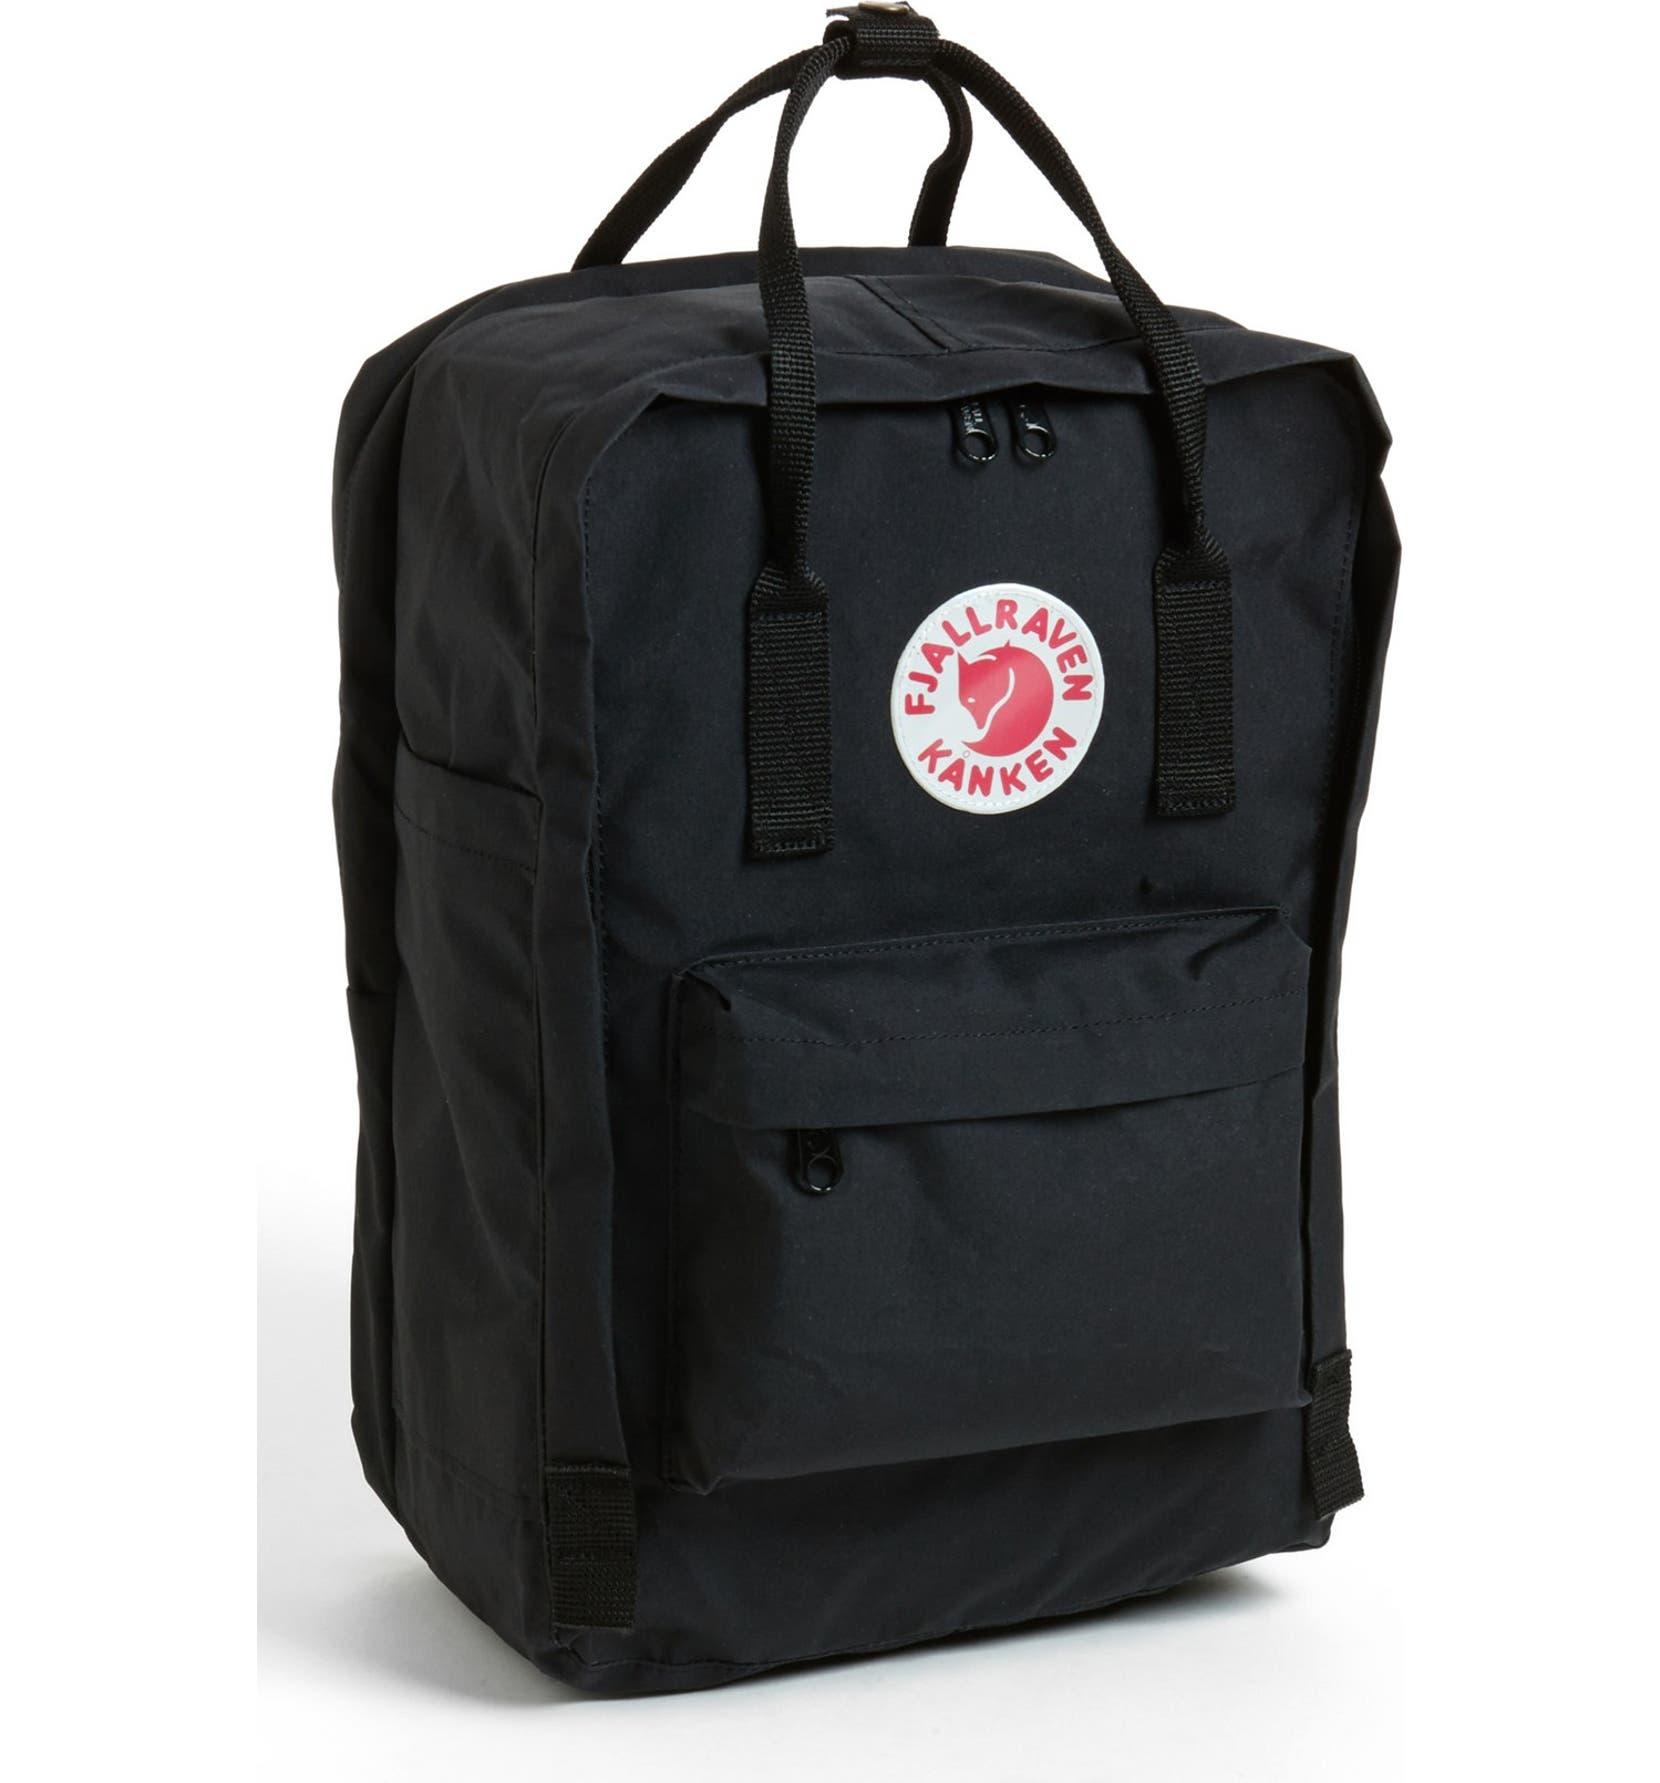 Kånken 15 Inch Laptop Backpack